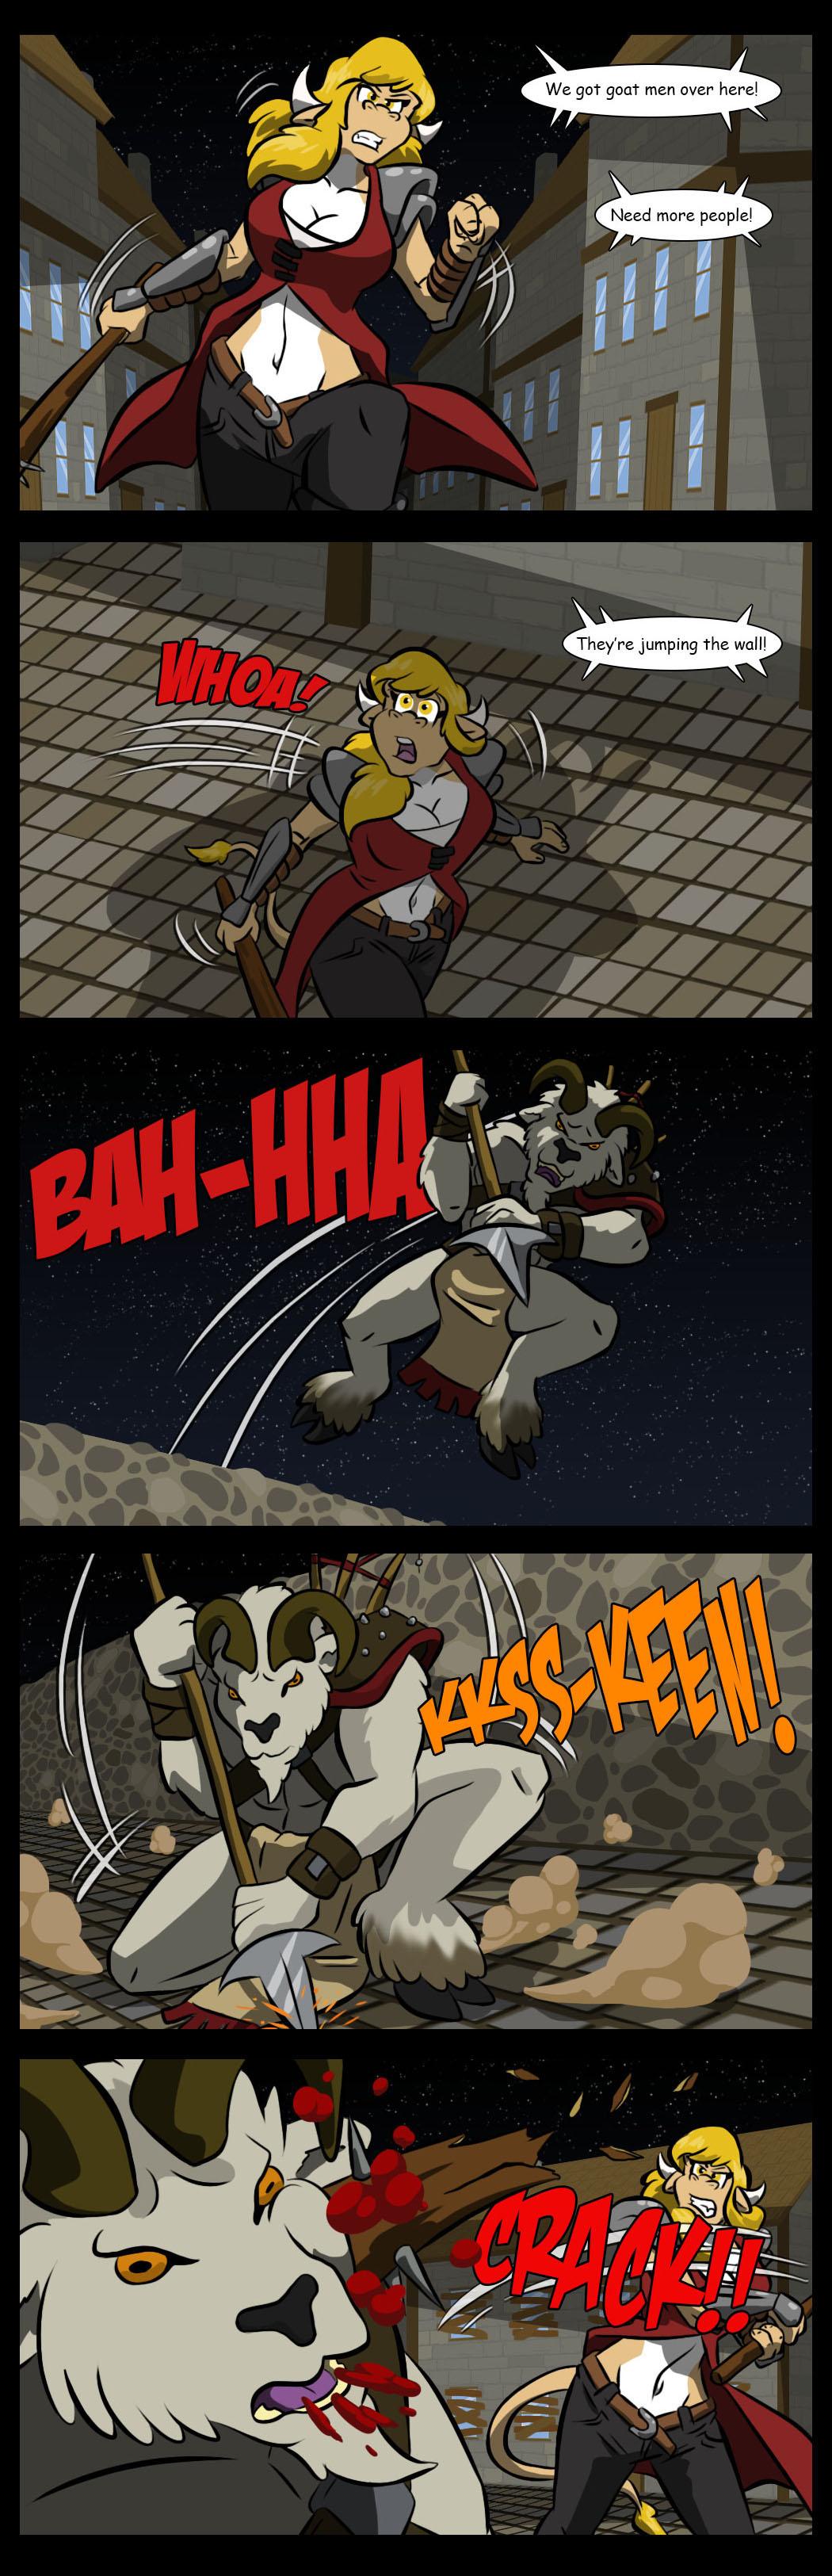 The goat men attack